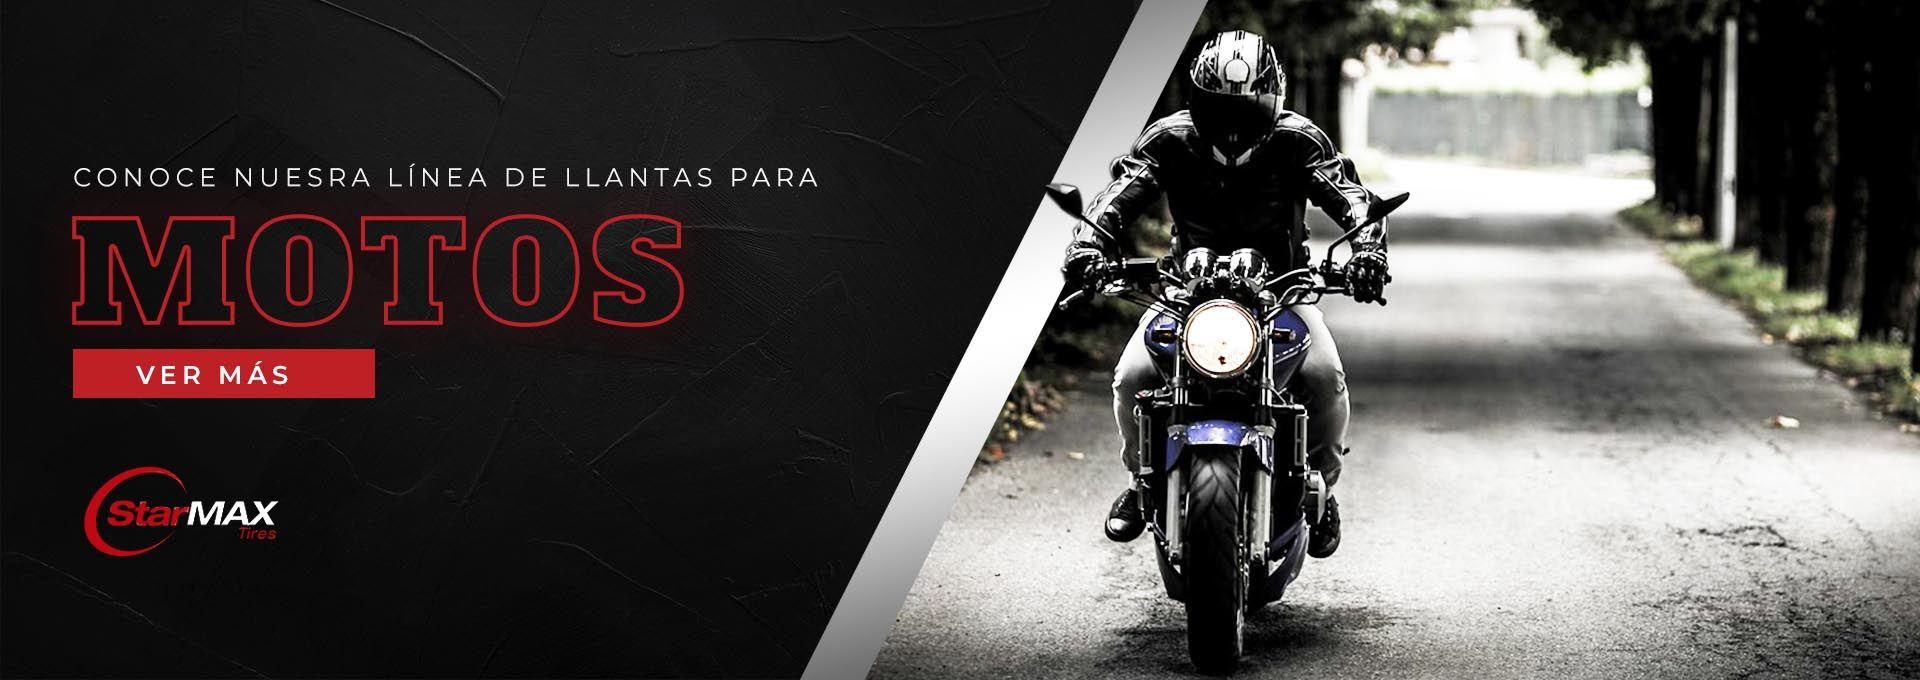 Banner llantas para motos-Redllantas